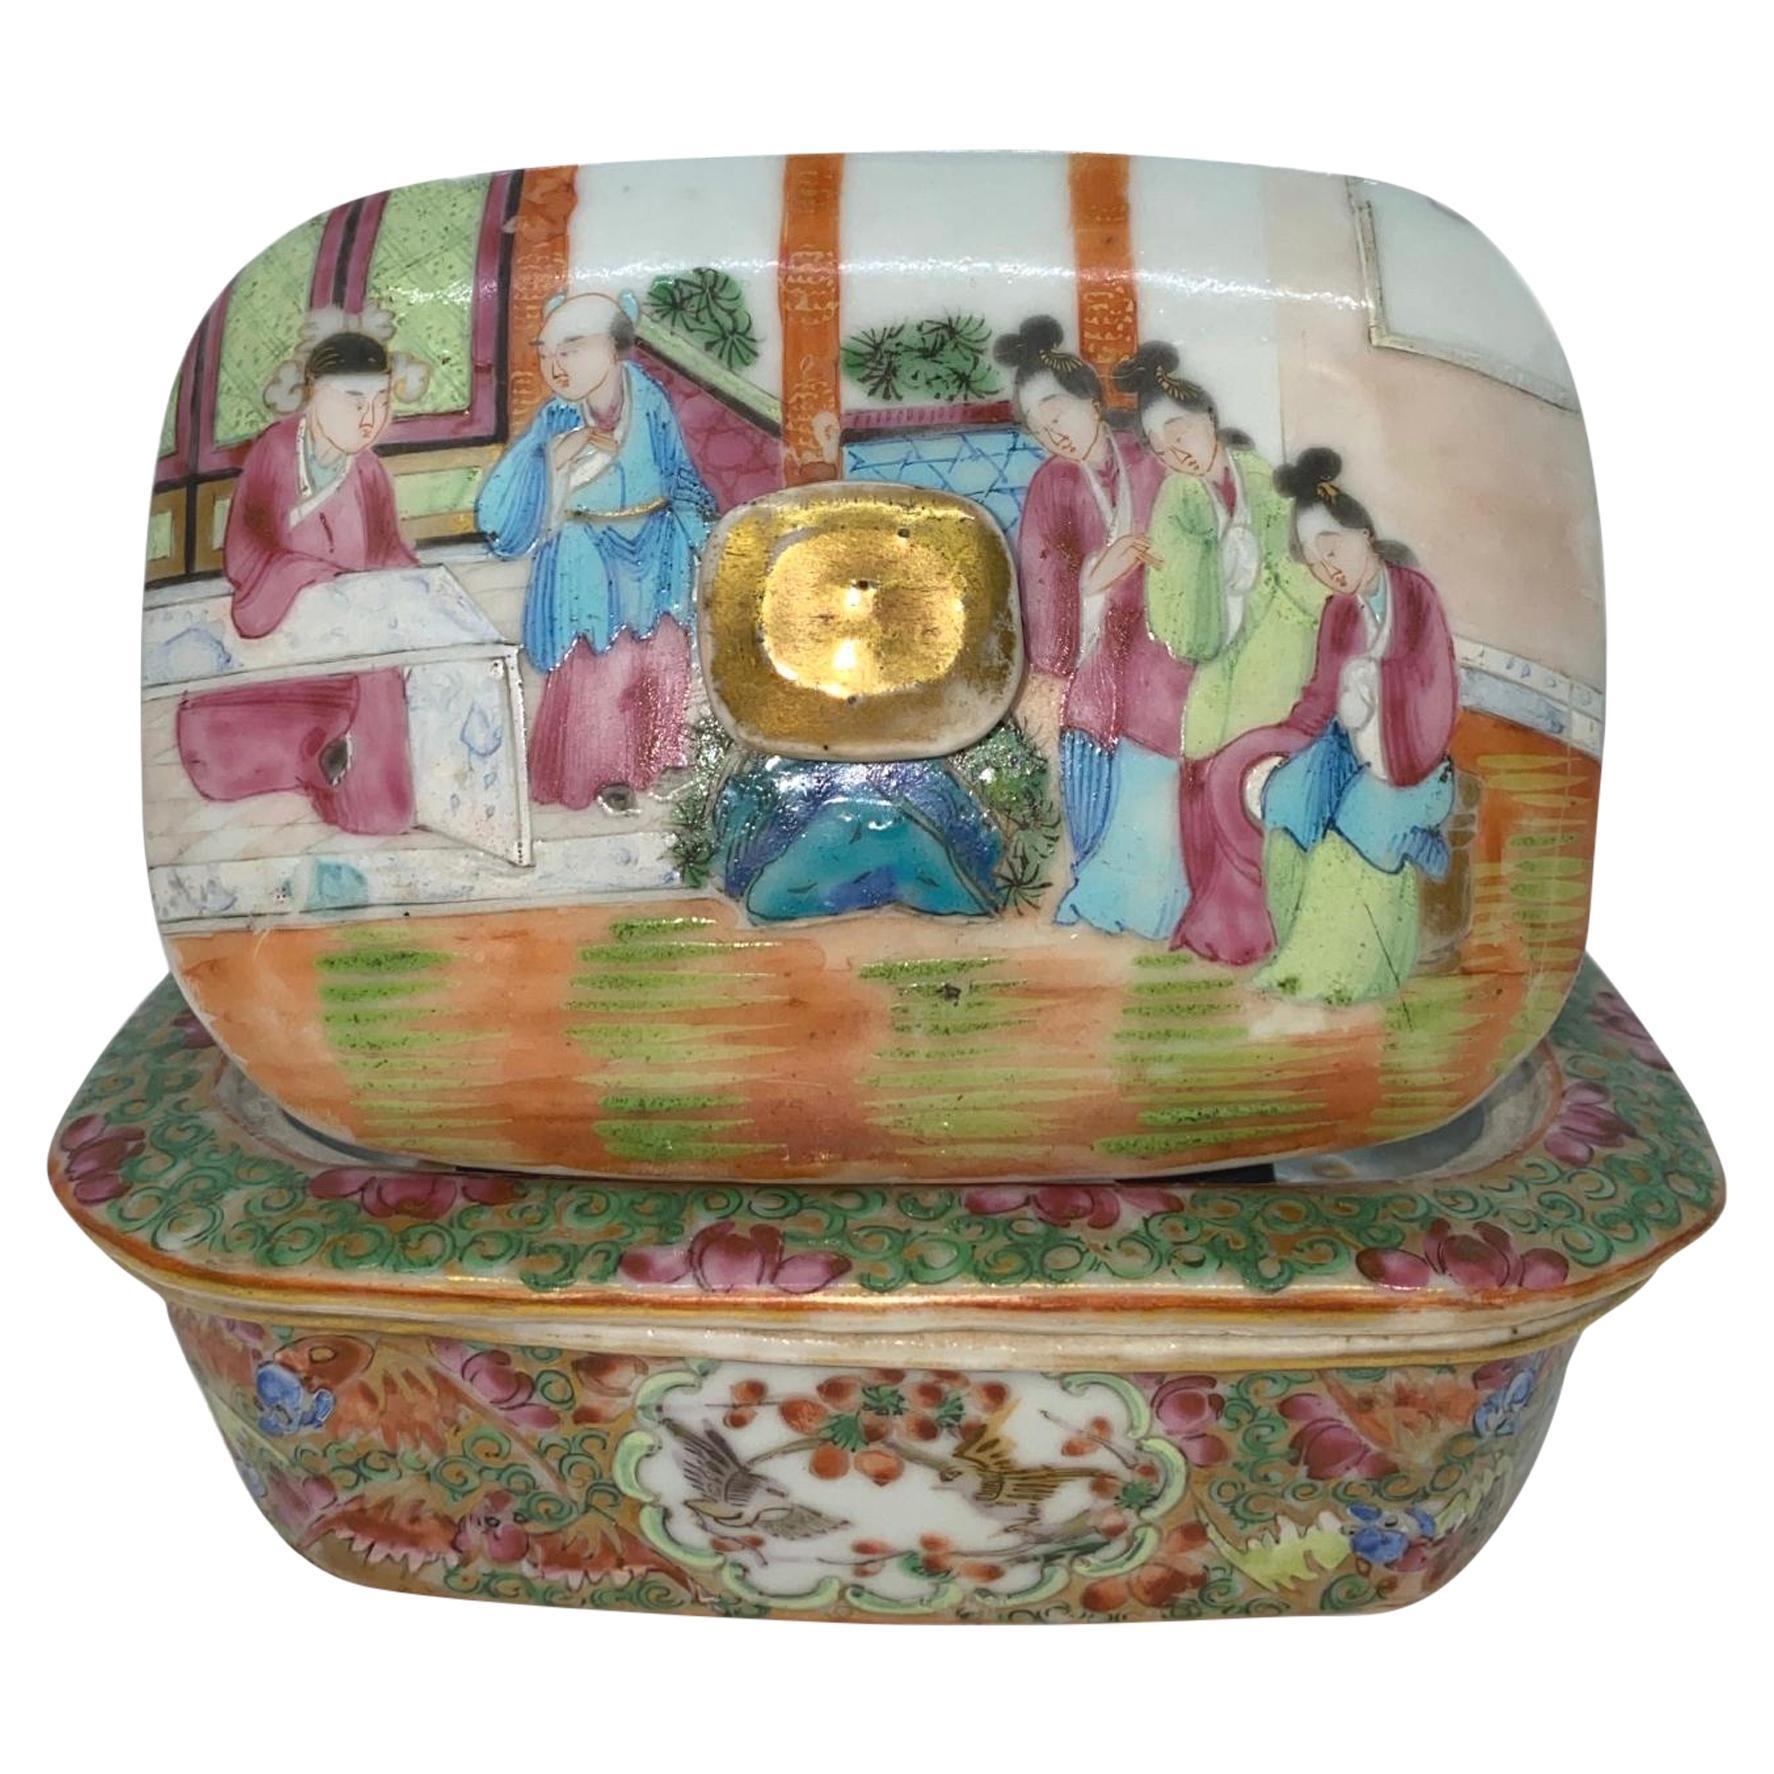 Chinese Export Porcelain Rose Mandarin Soap Dish, circa 1820